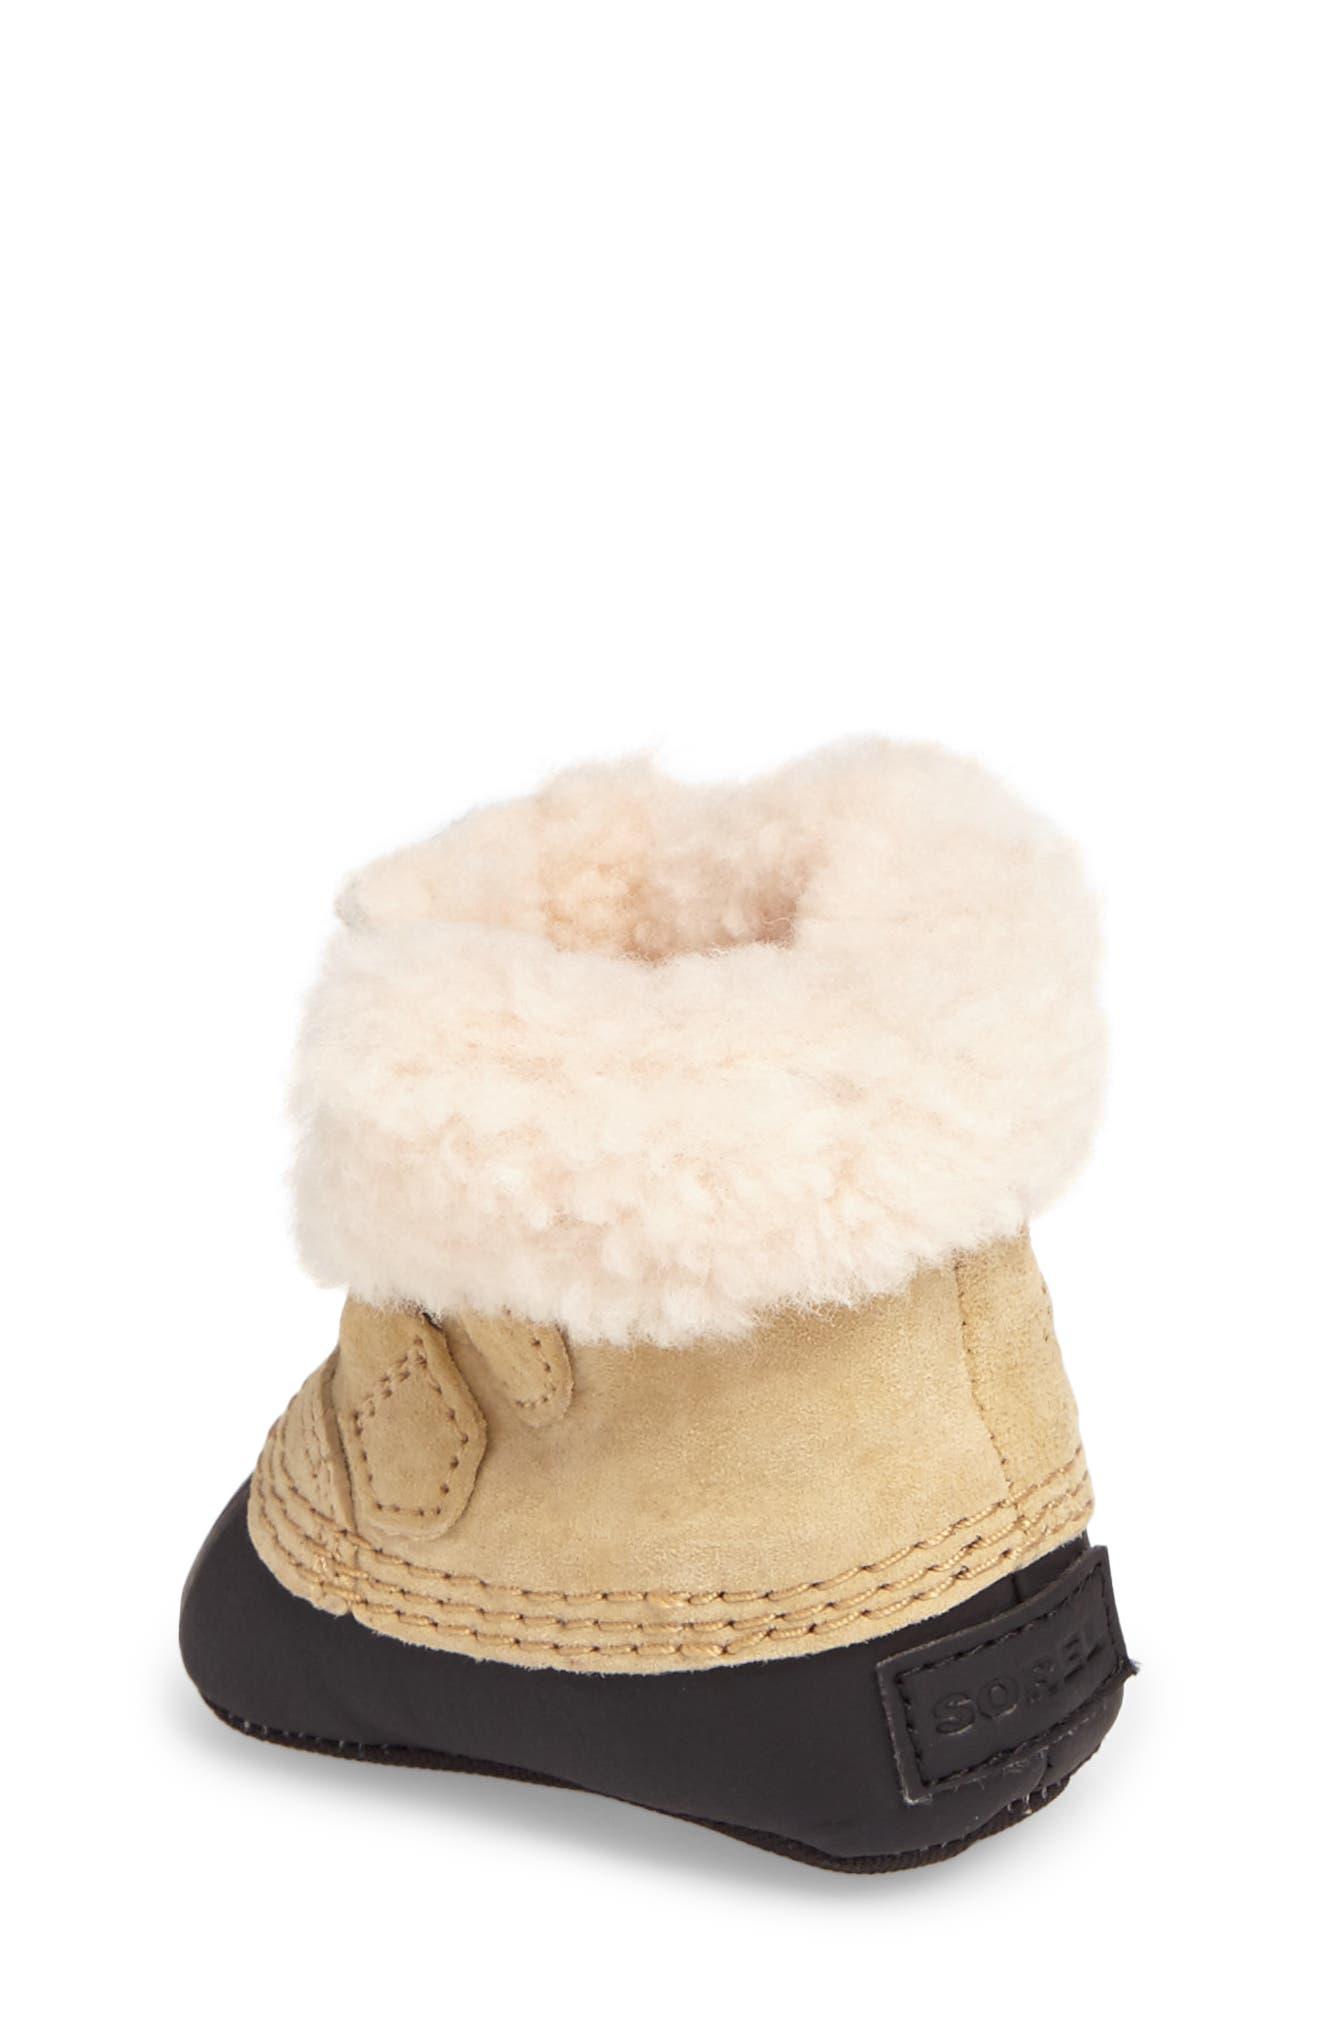 Alternate Image 2  - SOREL Caribootie Genuine Shearling Crib Shoe (Baby)